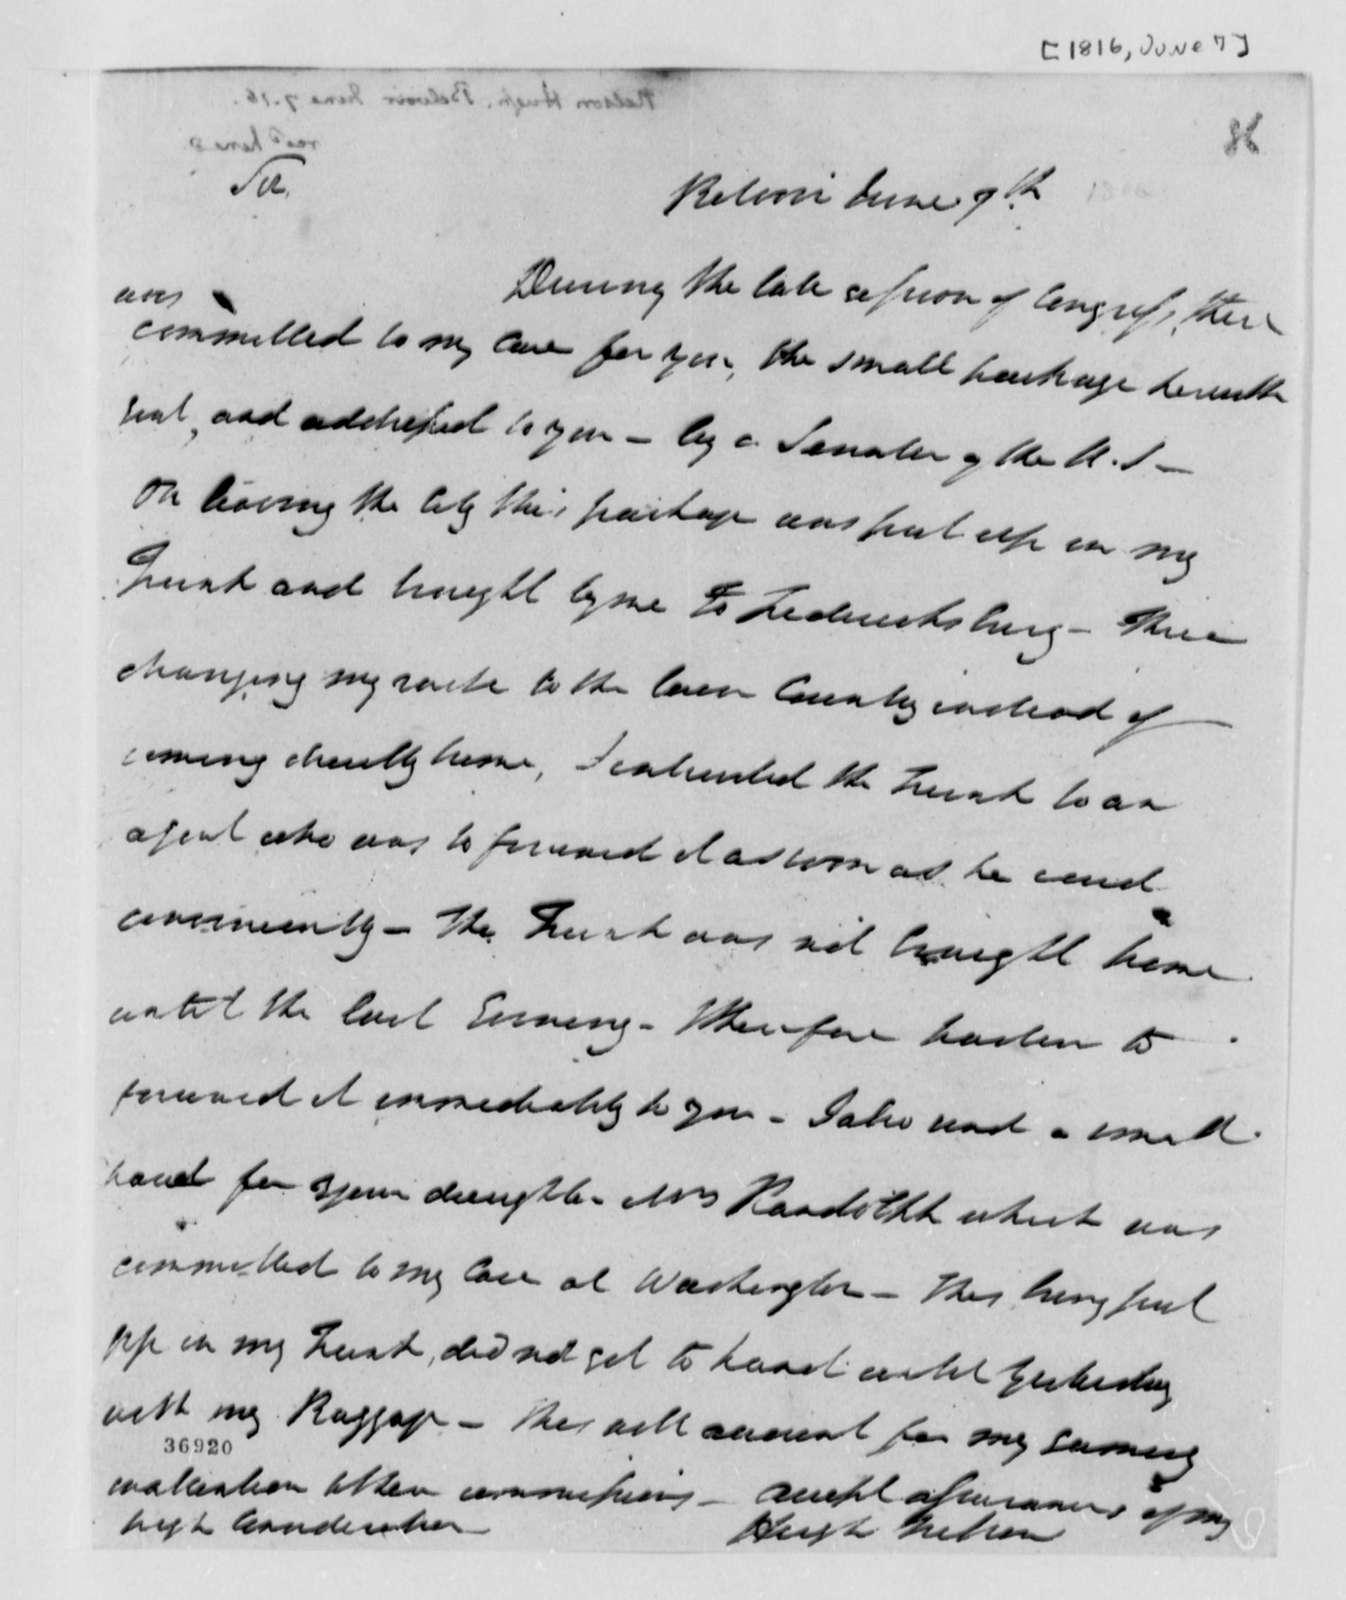 Hugh Nelson to Thomas Jefferson, June 7, 1816